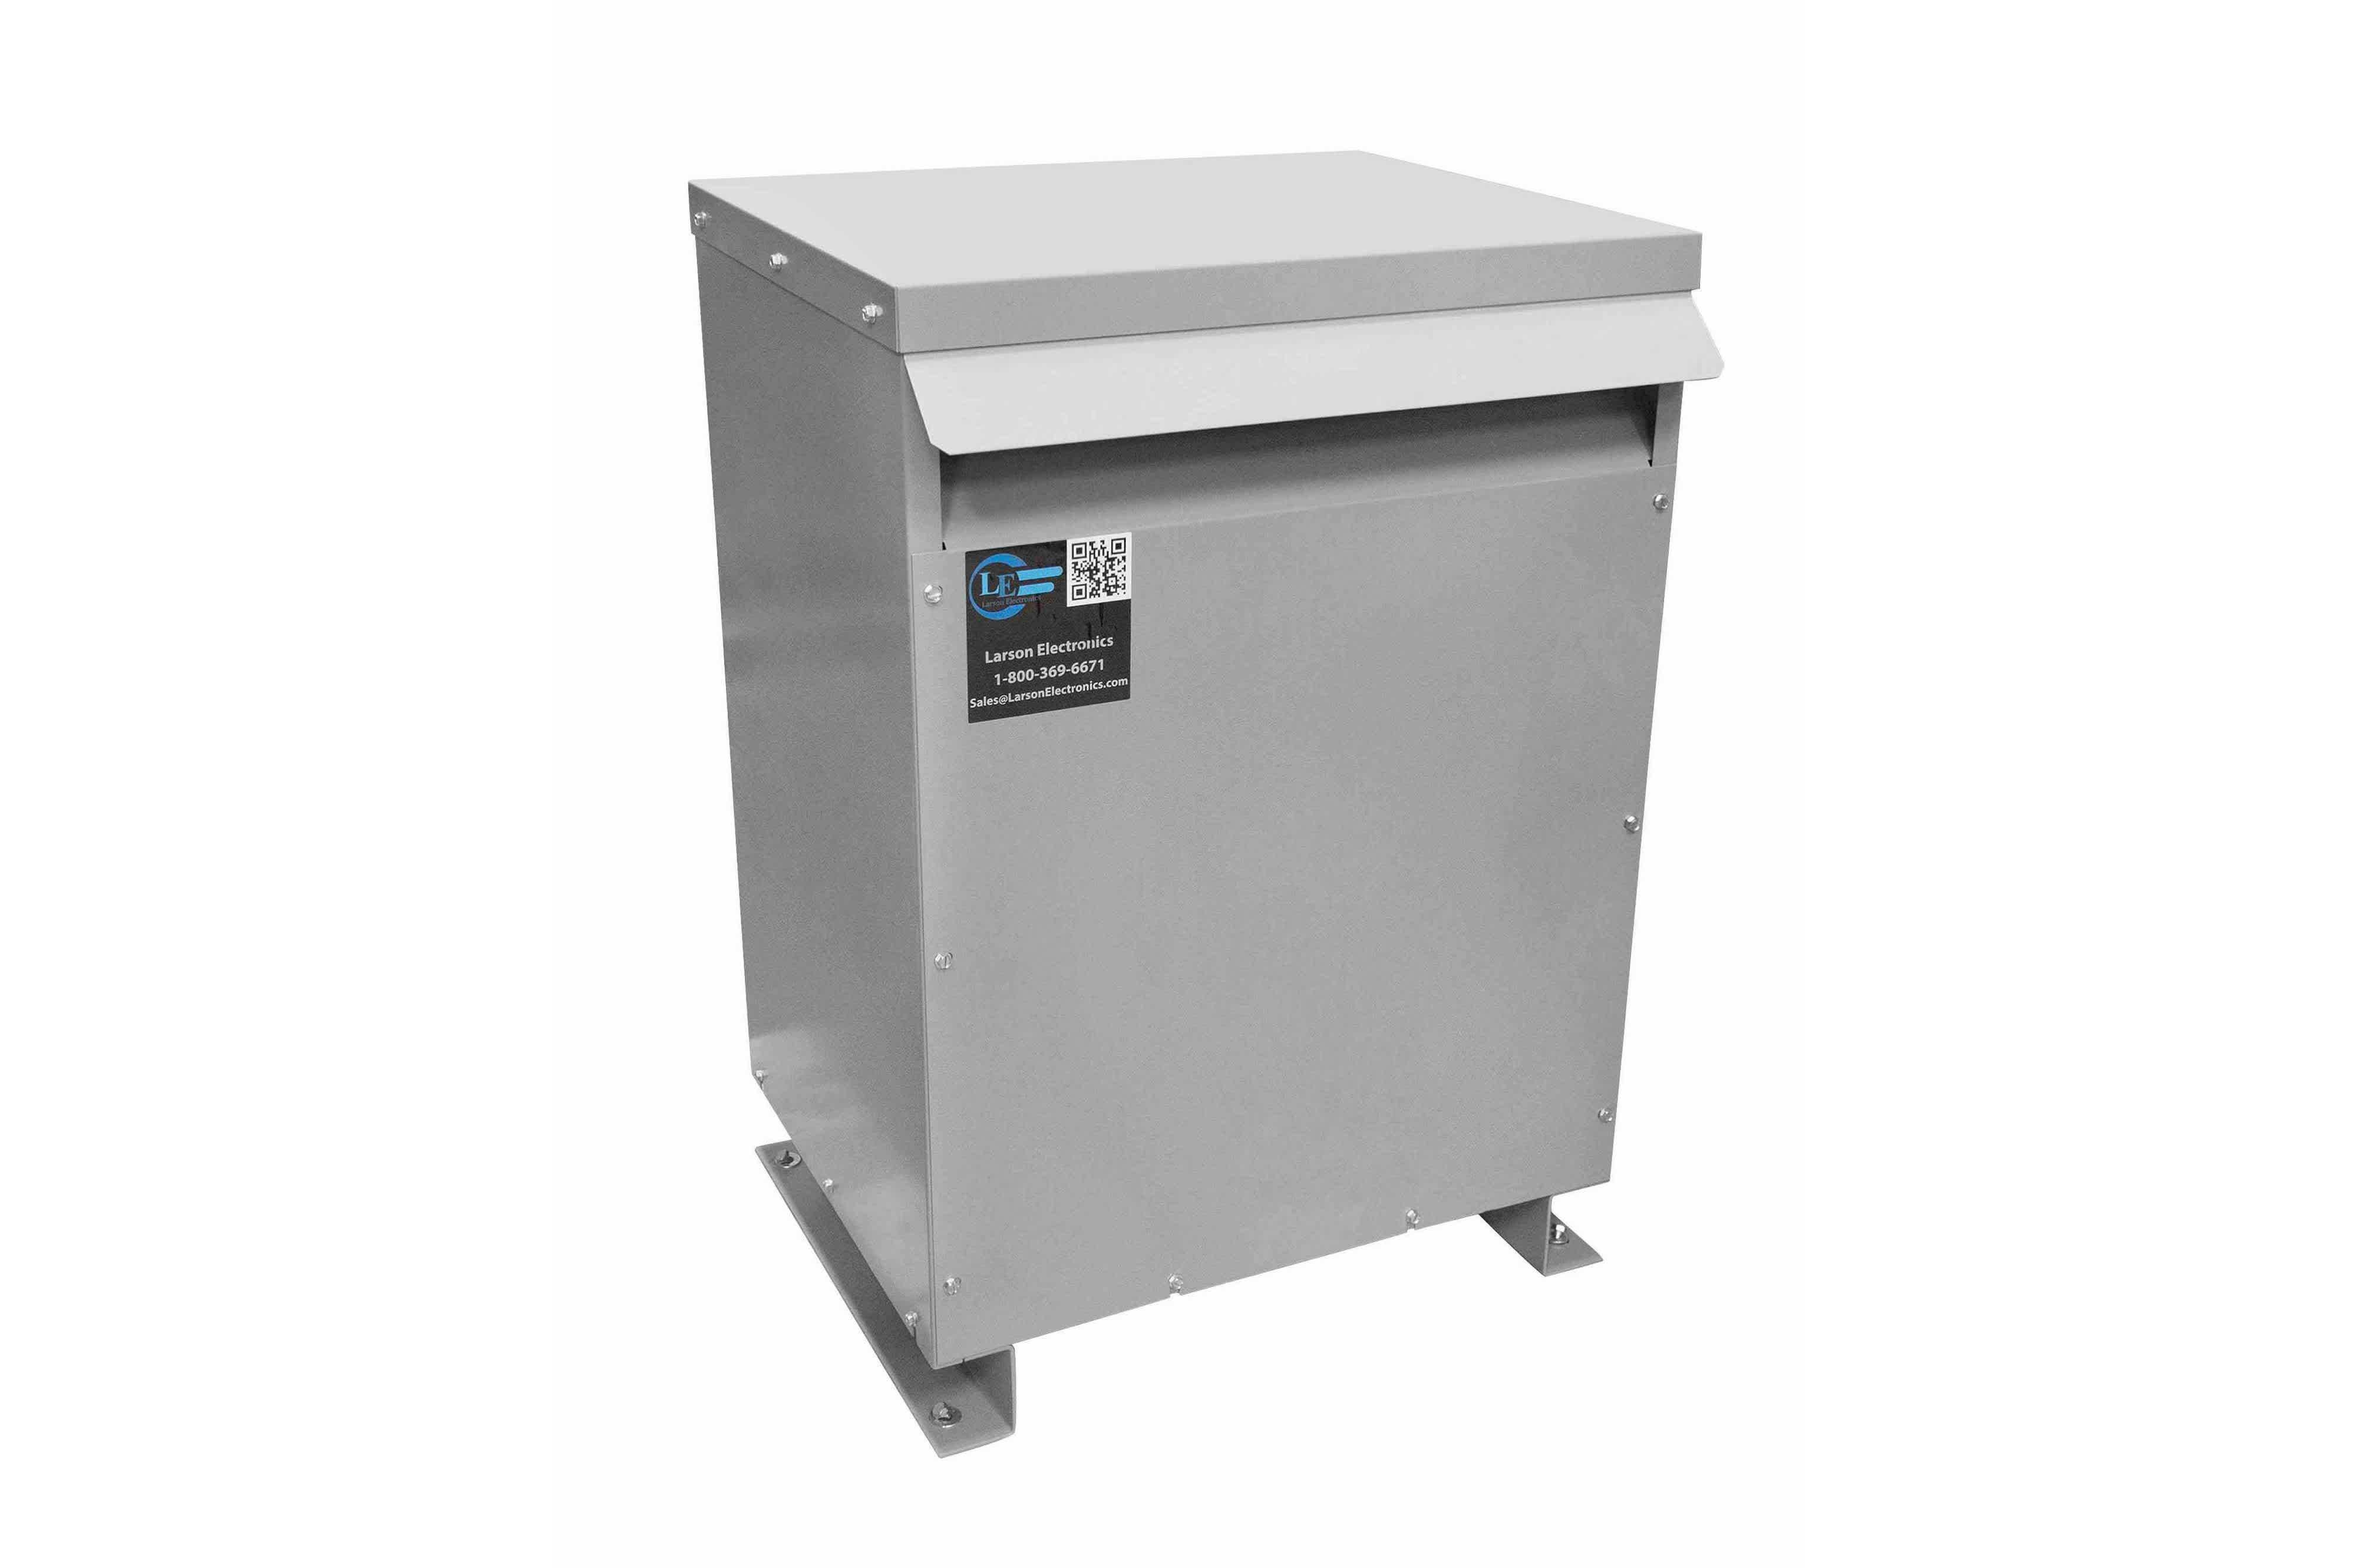 300 kVA 3PH Isolation Transformer, 208V Wye Primary, 380V Delta Secondary, N3R, Ventilated, 60 Hz